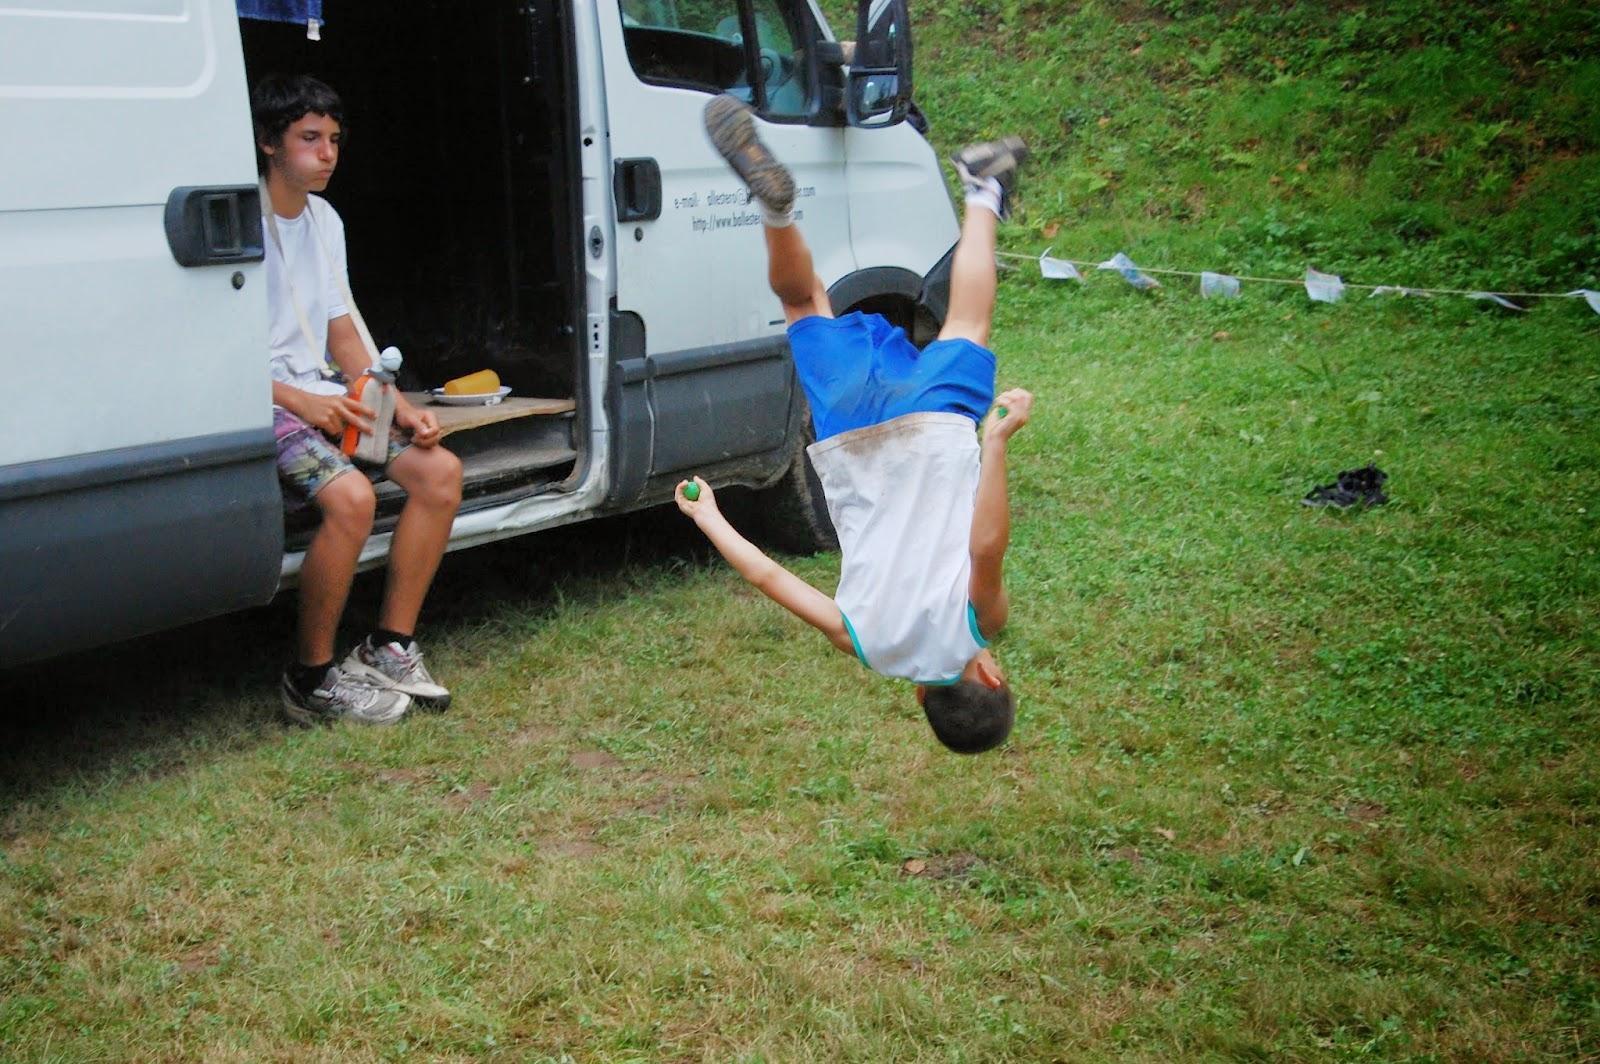 Campaments Estiu RolandKing 2011 - DSC_0245.JPG